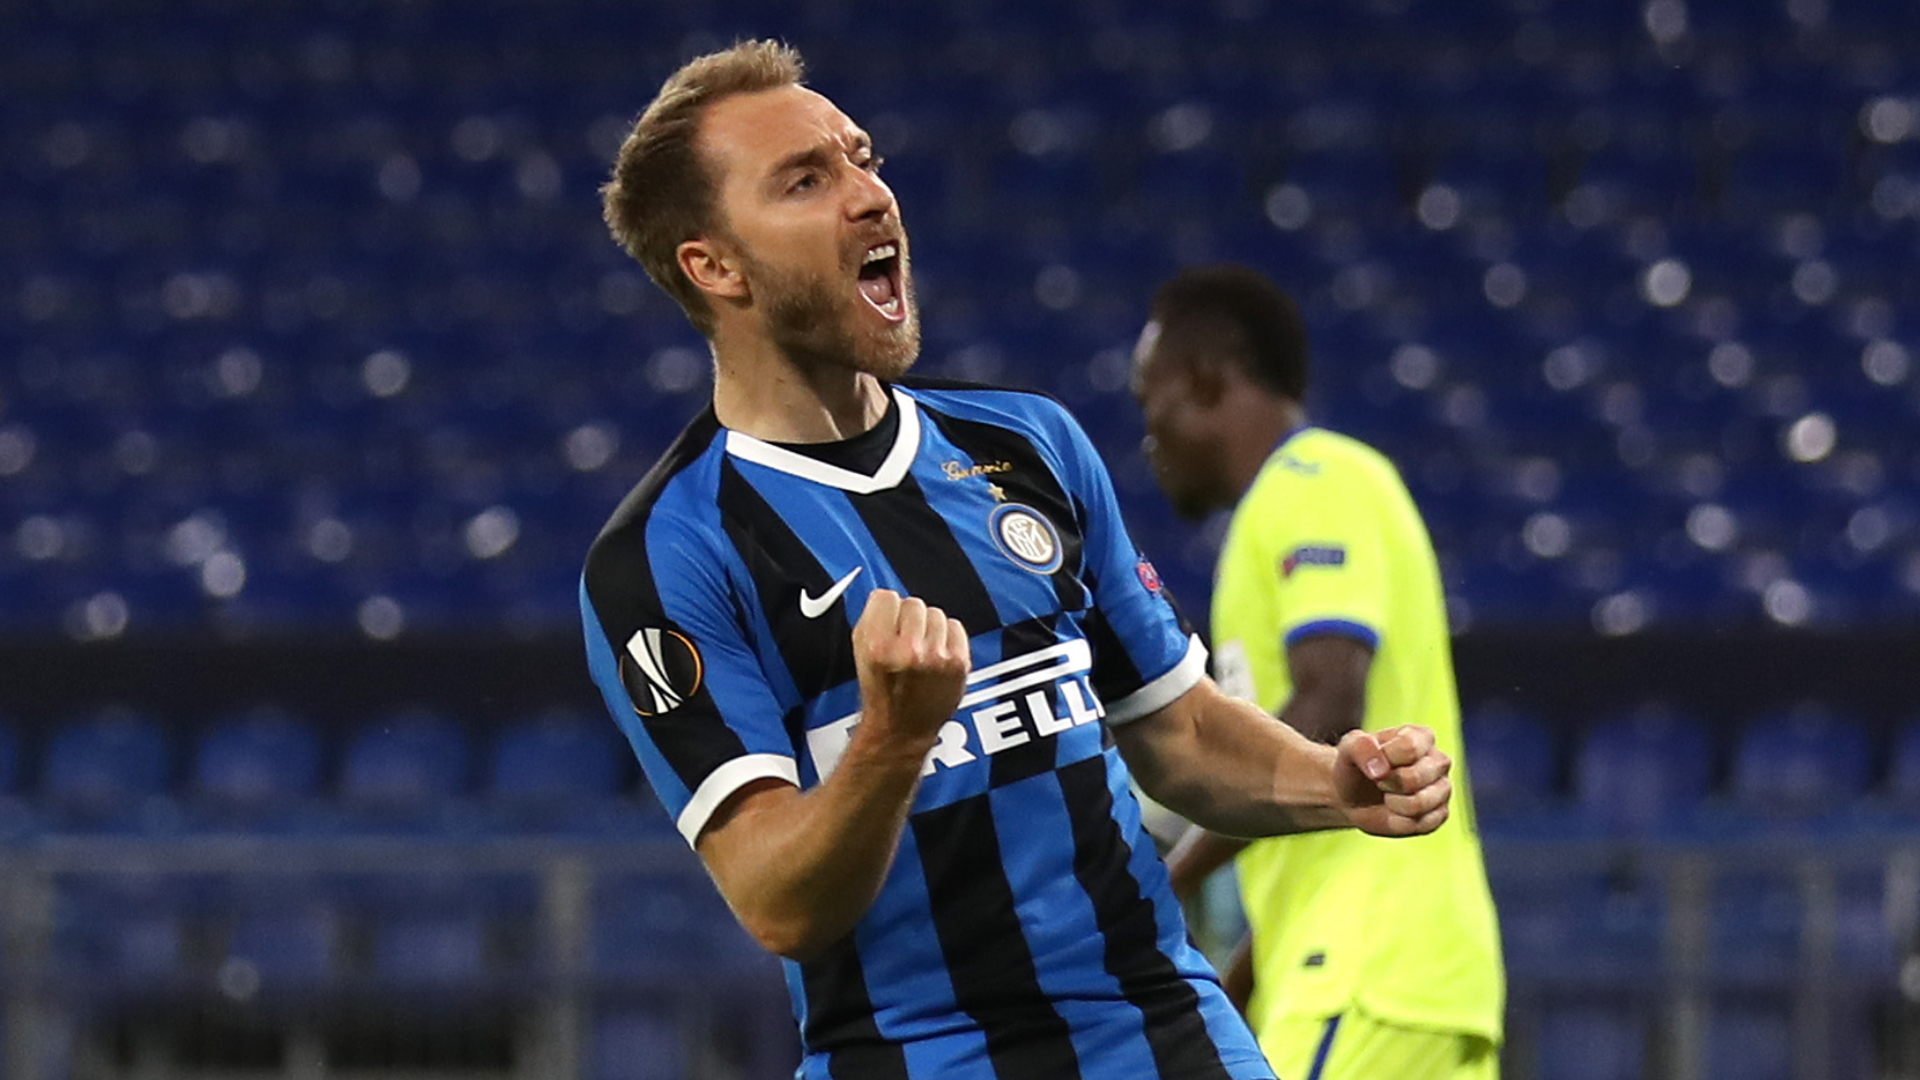 Inter star striker Lukaku sets Europa League record